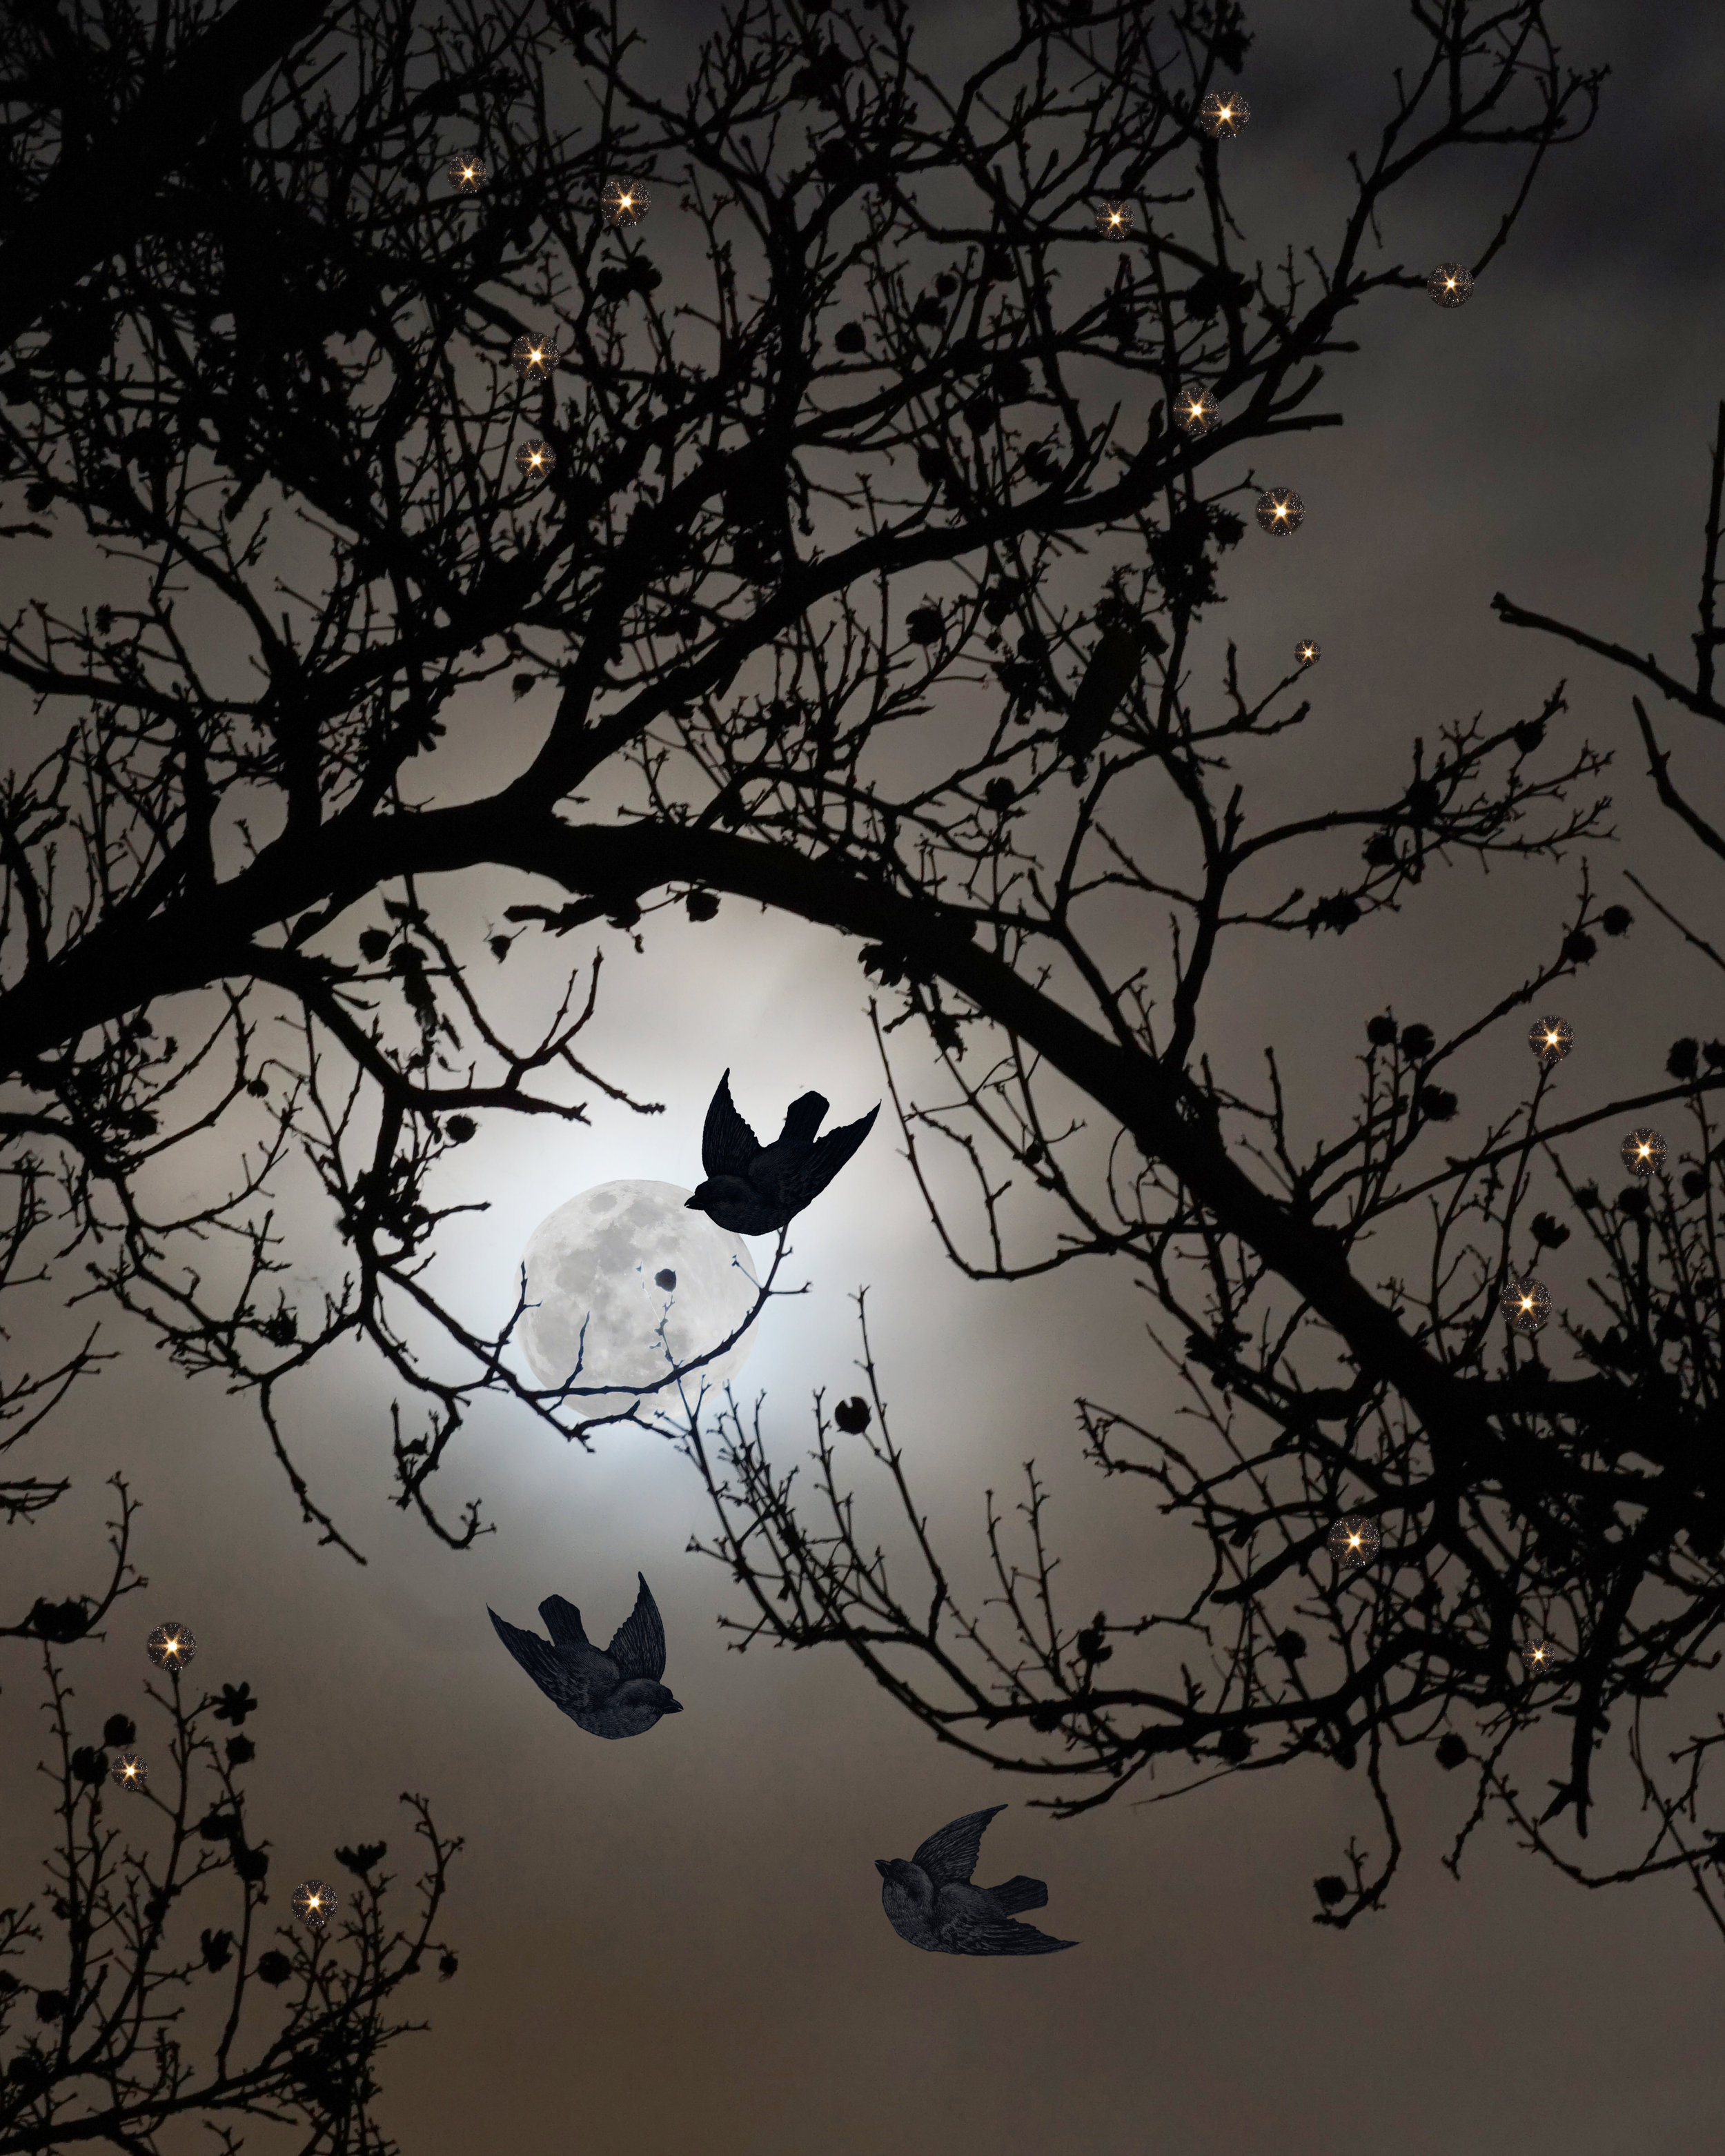 Bird Its a dark feeling_2.jpg